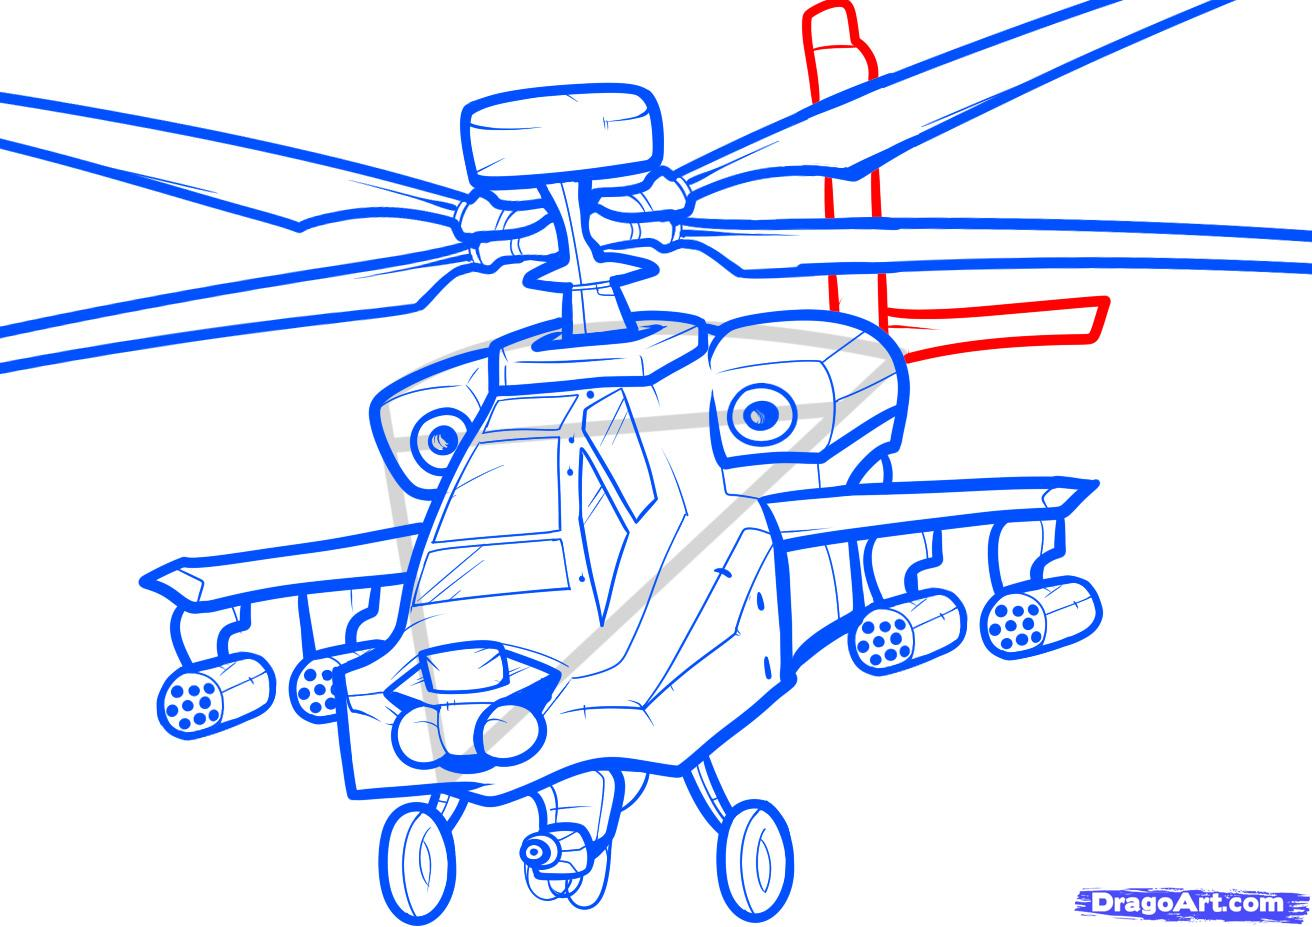 Рисуем вертолет AH-64 Apache - шаг 8